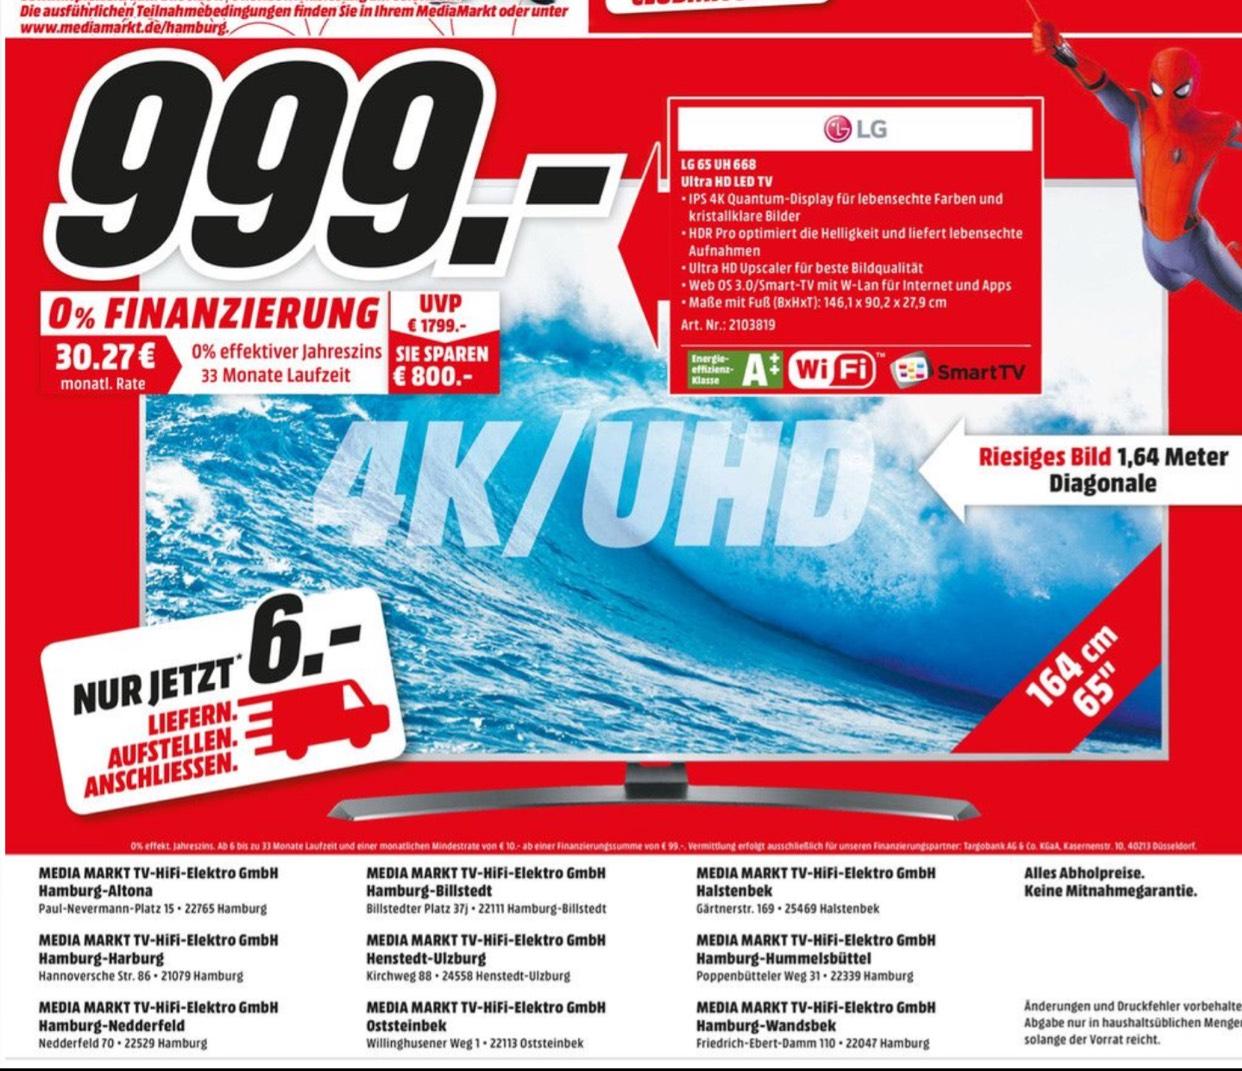 [LOKAL HH] LG 65 UH 668 4K UHD + HDR PRO nur 999€ statt 1499€